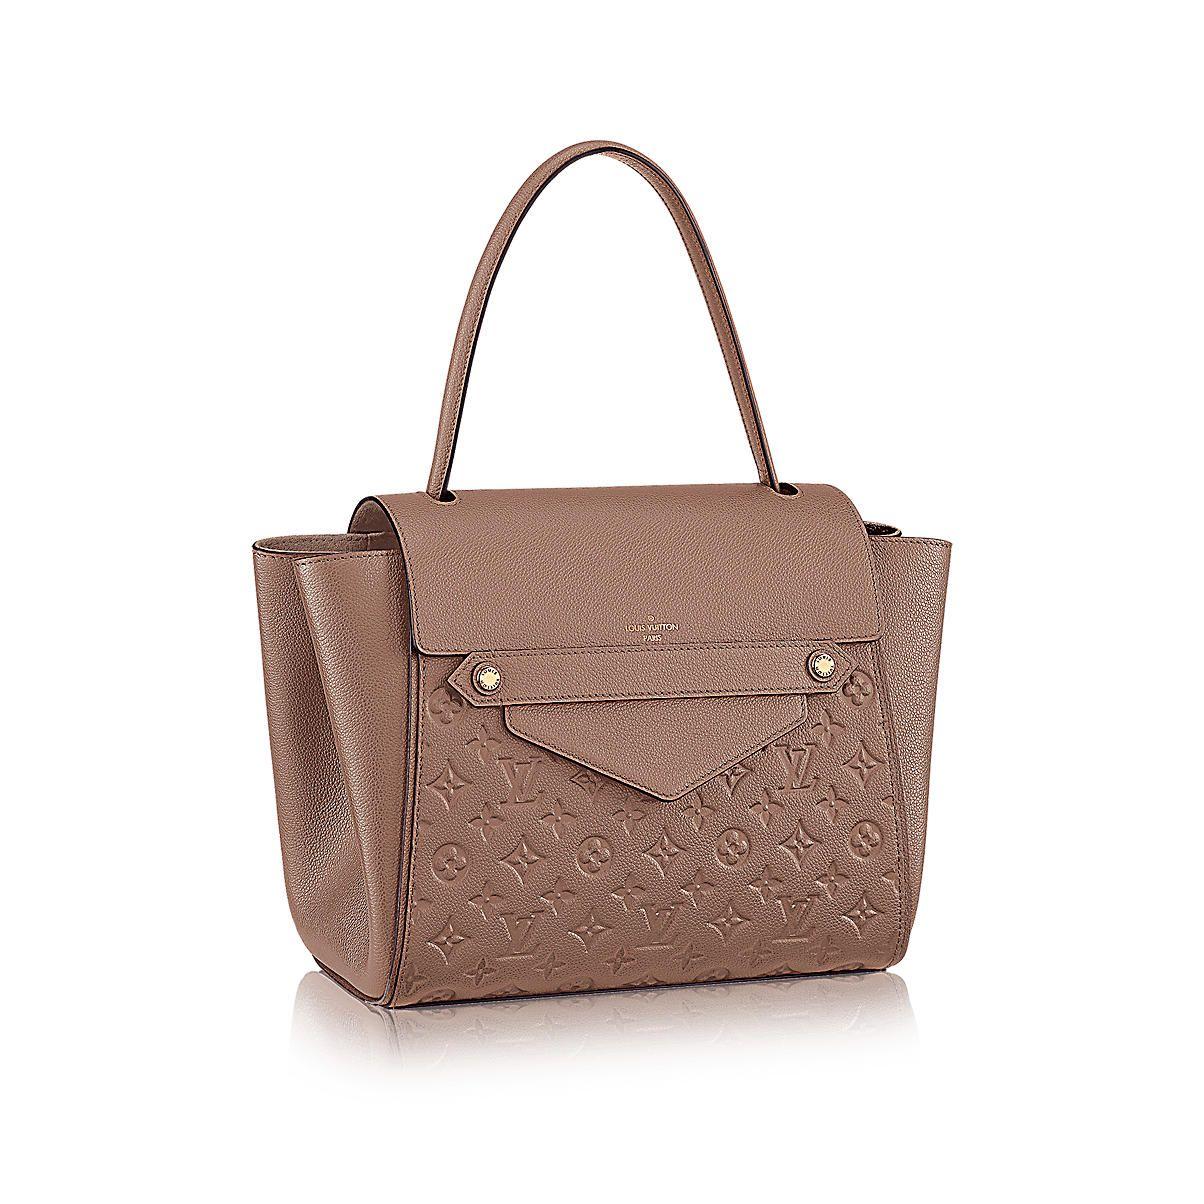 Trocadero +Monogram Empreinte Leather - Handbags  81e4ee2b37459